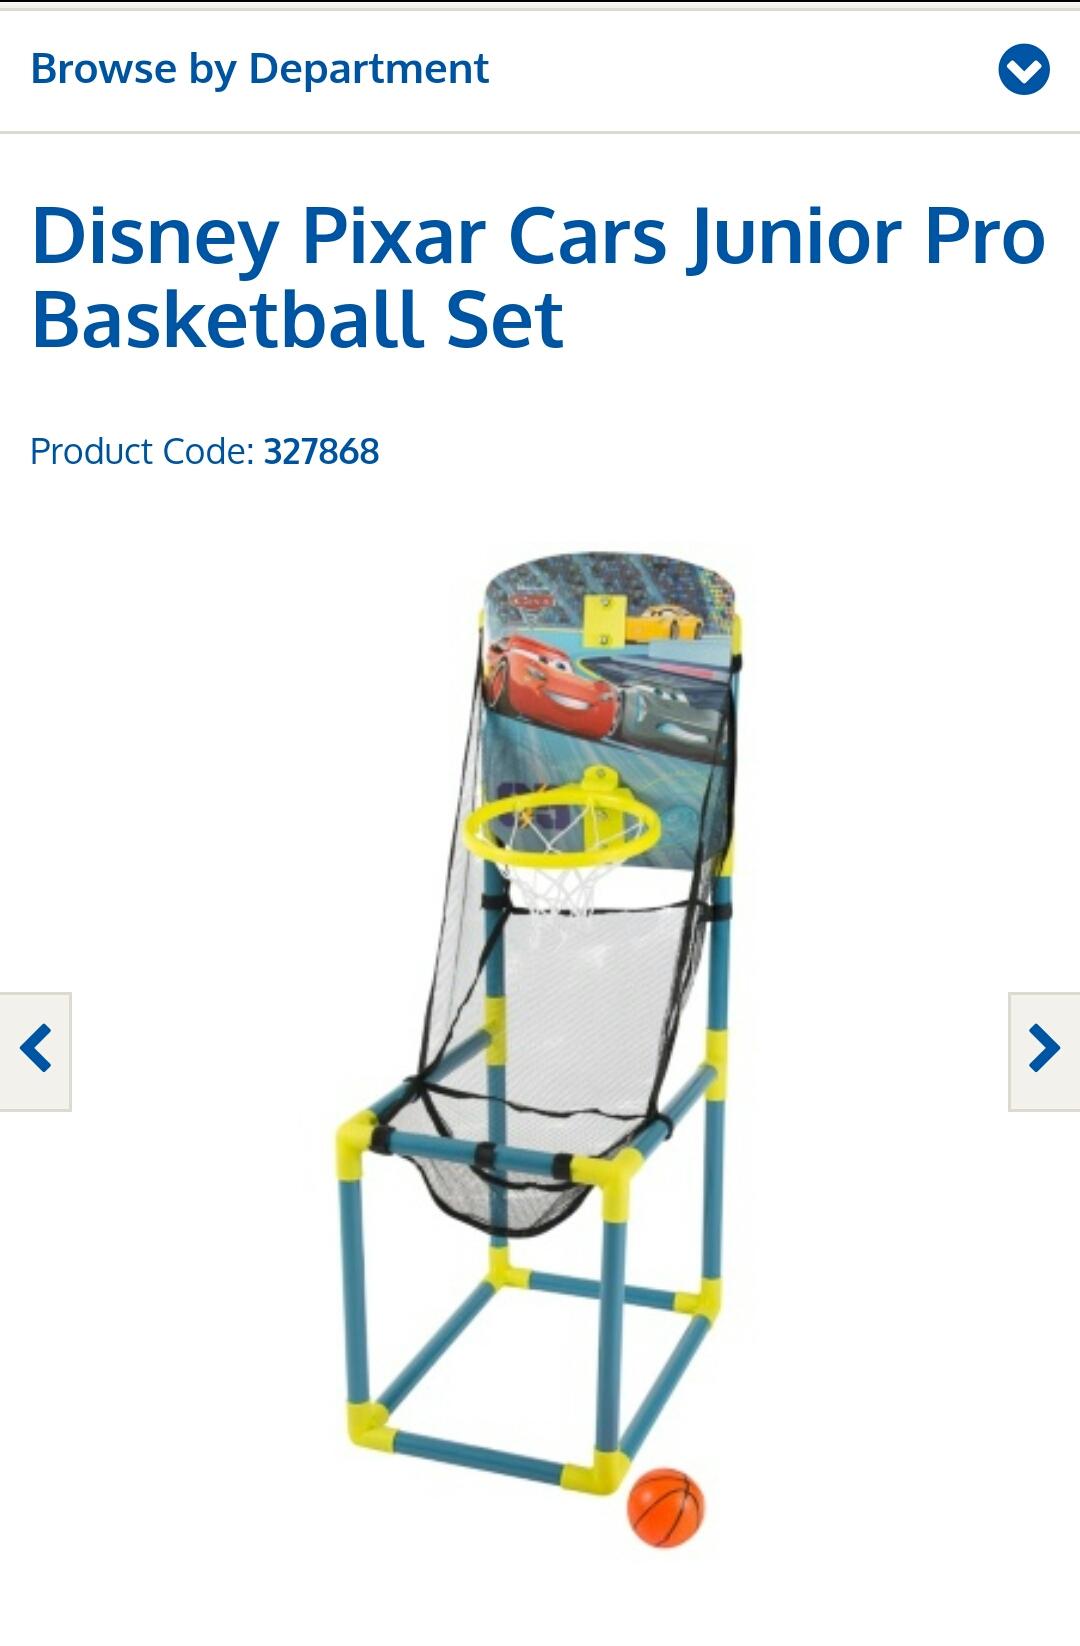 Disney Pixar Cars Junior Pro Basketball Set - £6.99 @ B&M